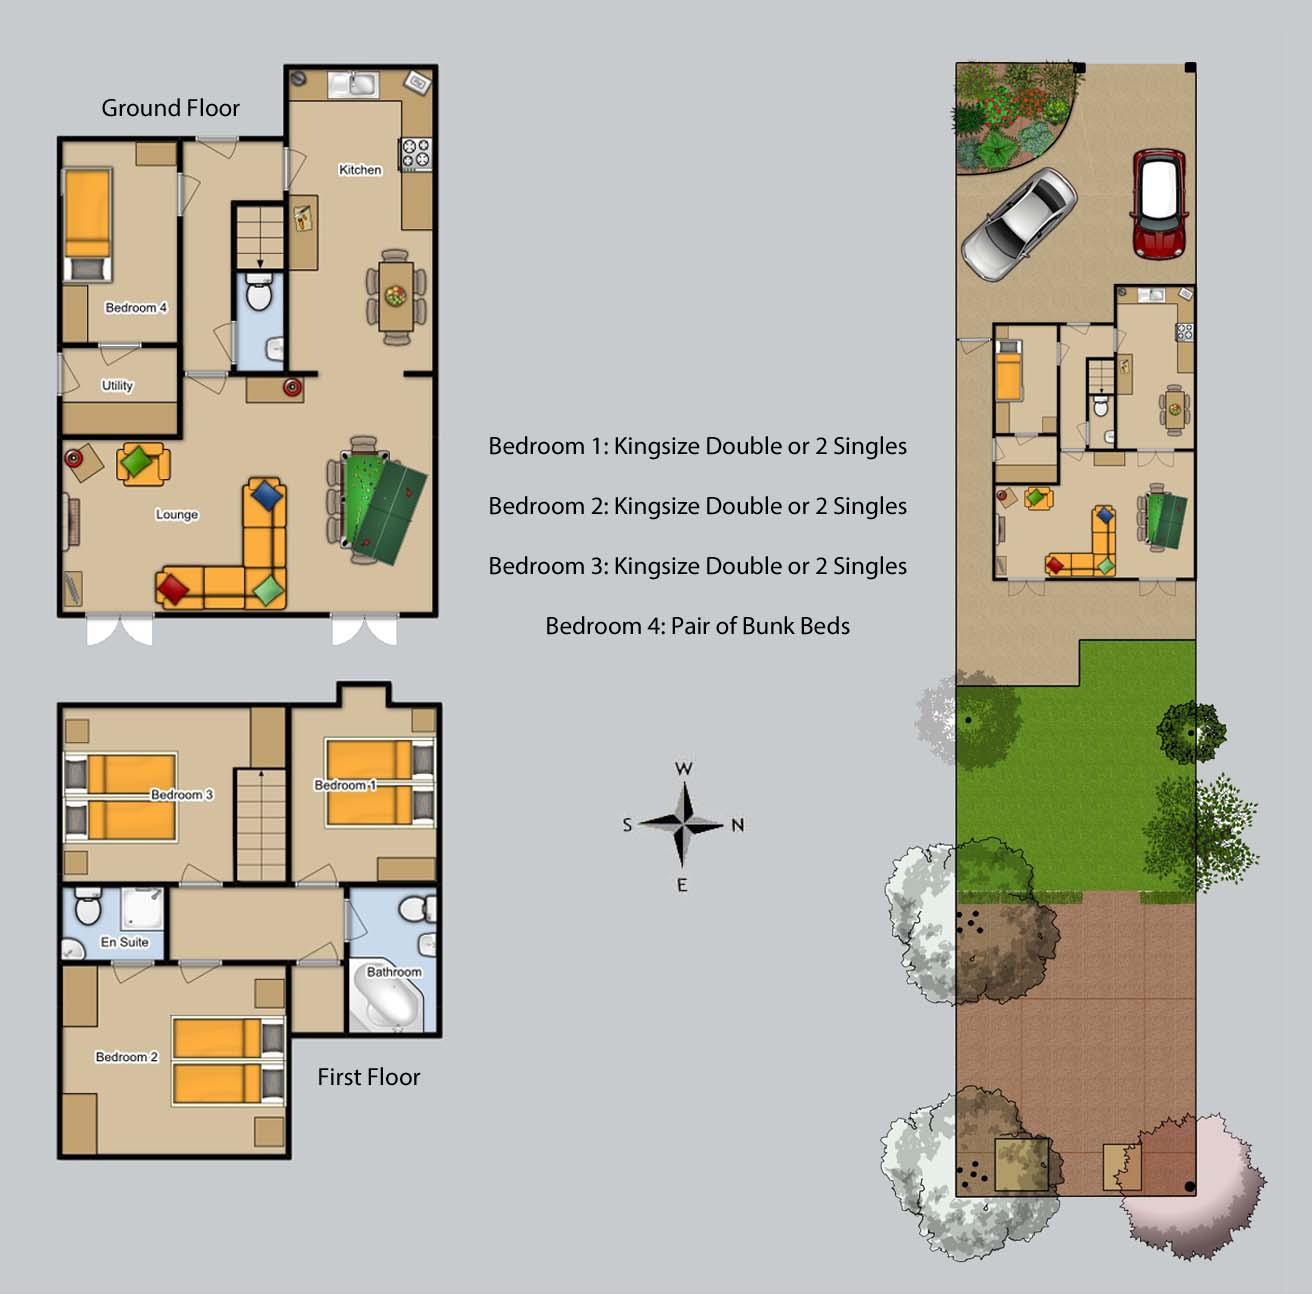 Floor plan for Grove House